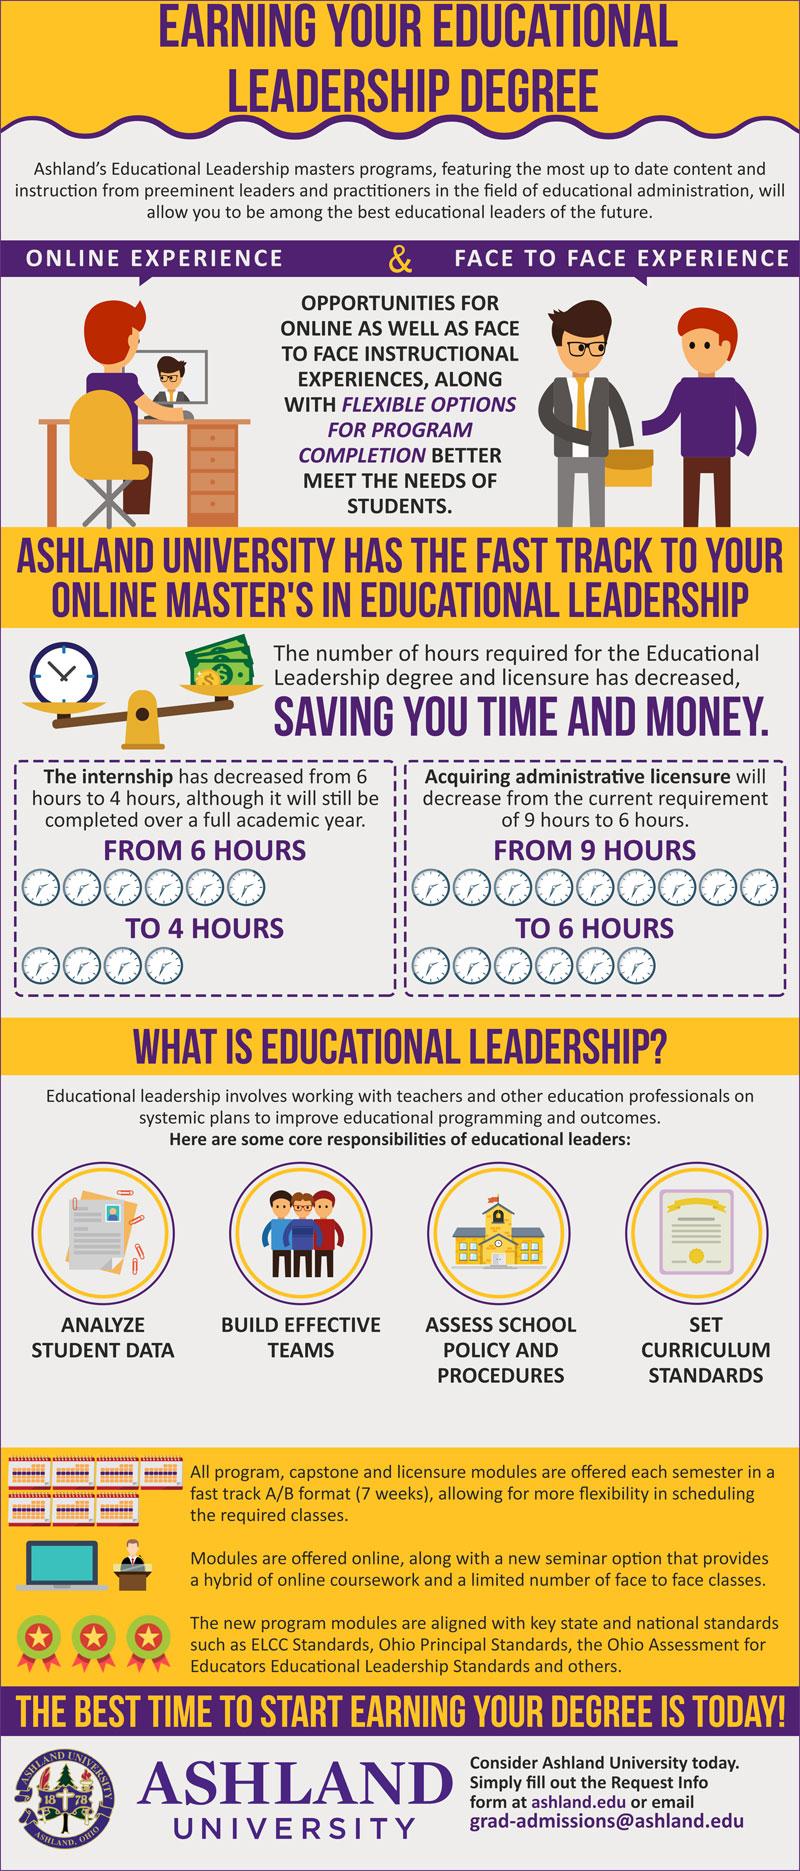 Earning Your Educational Leadership Degree